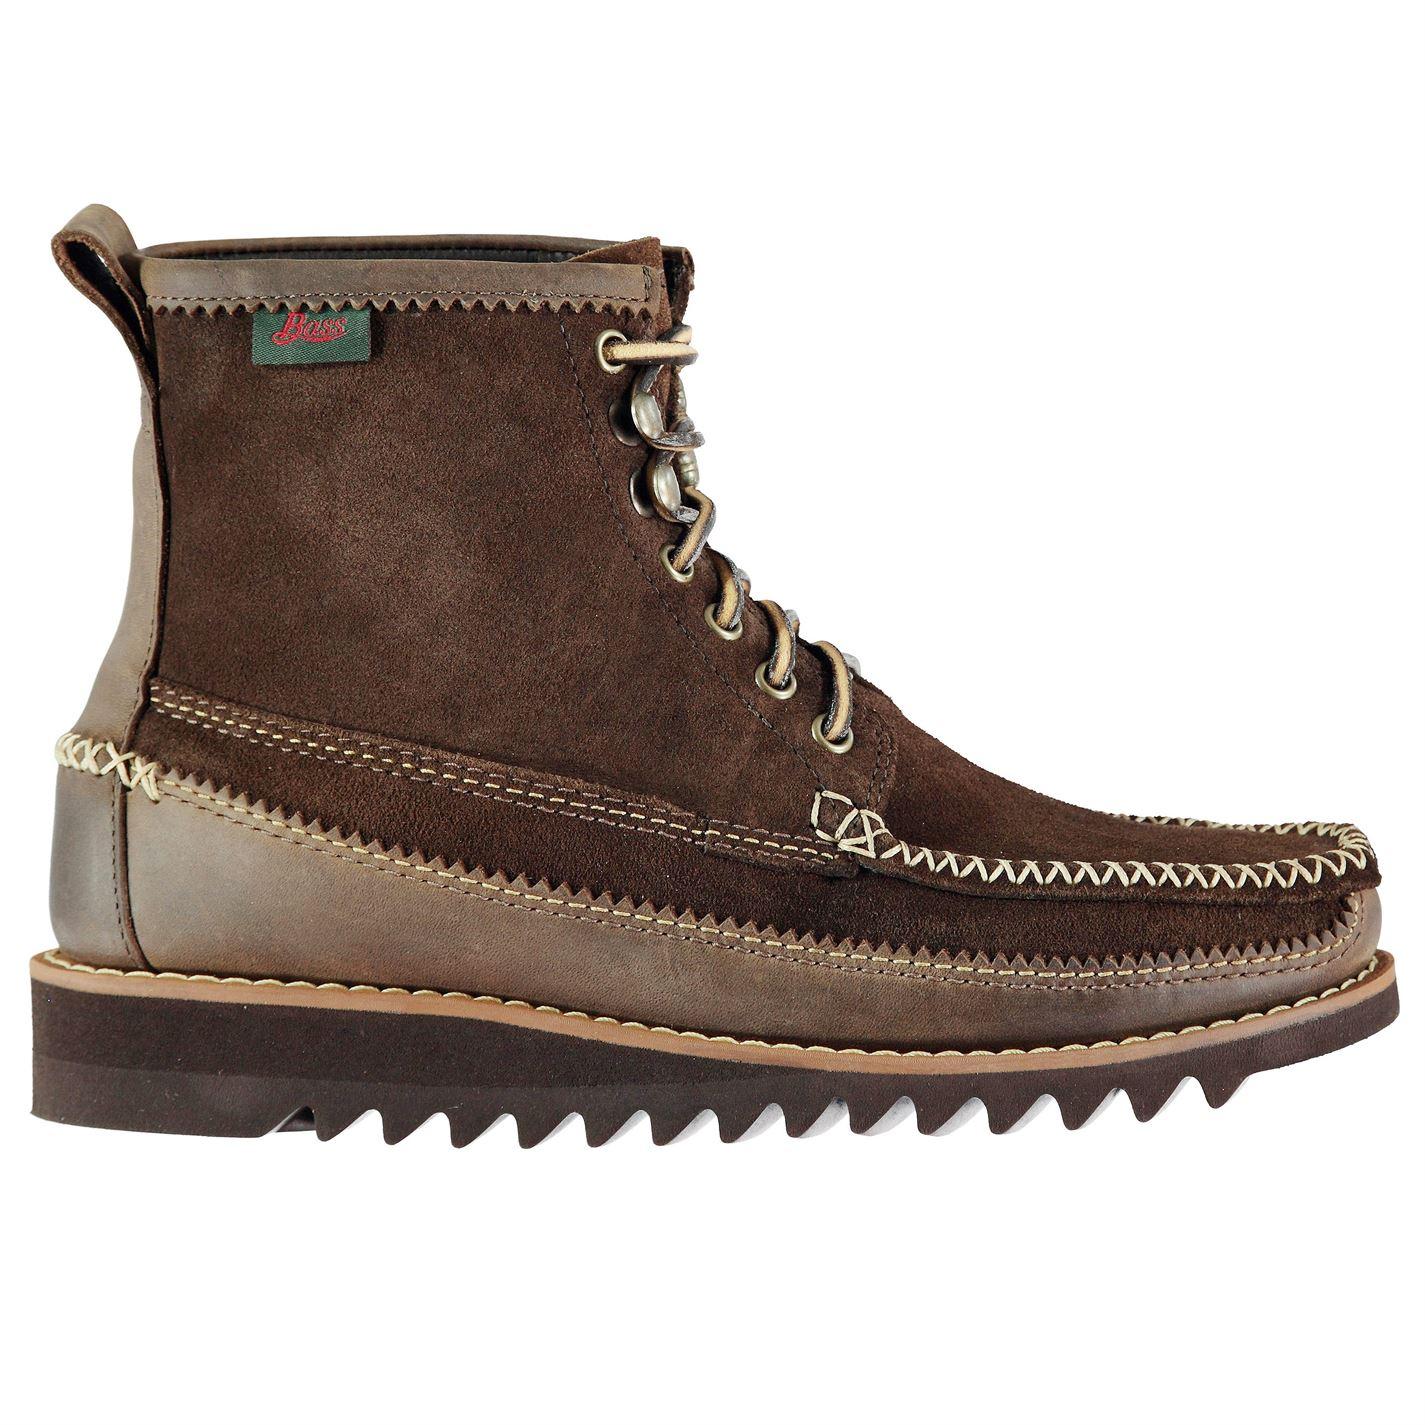 Bass Weejuns Lyndon Hi Winter Boots